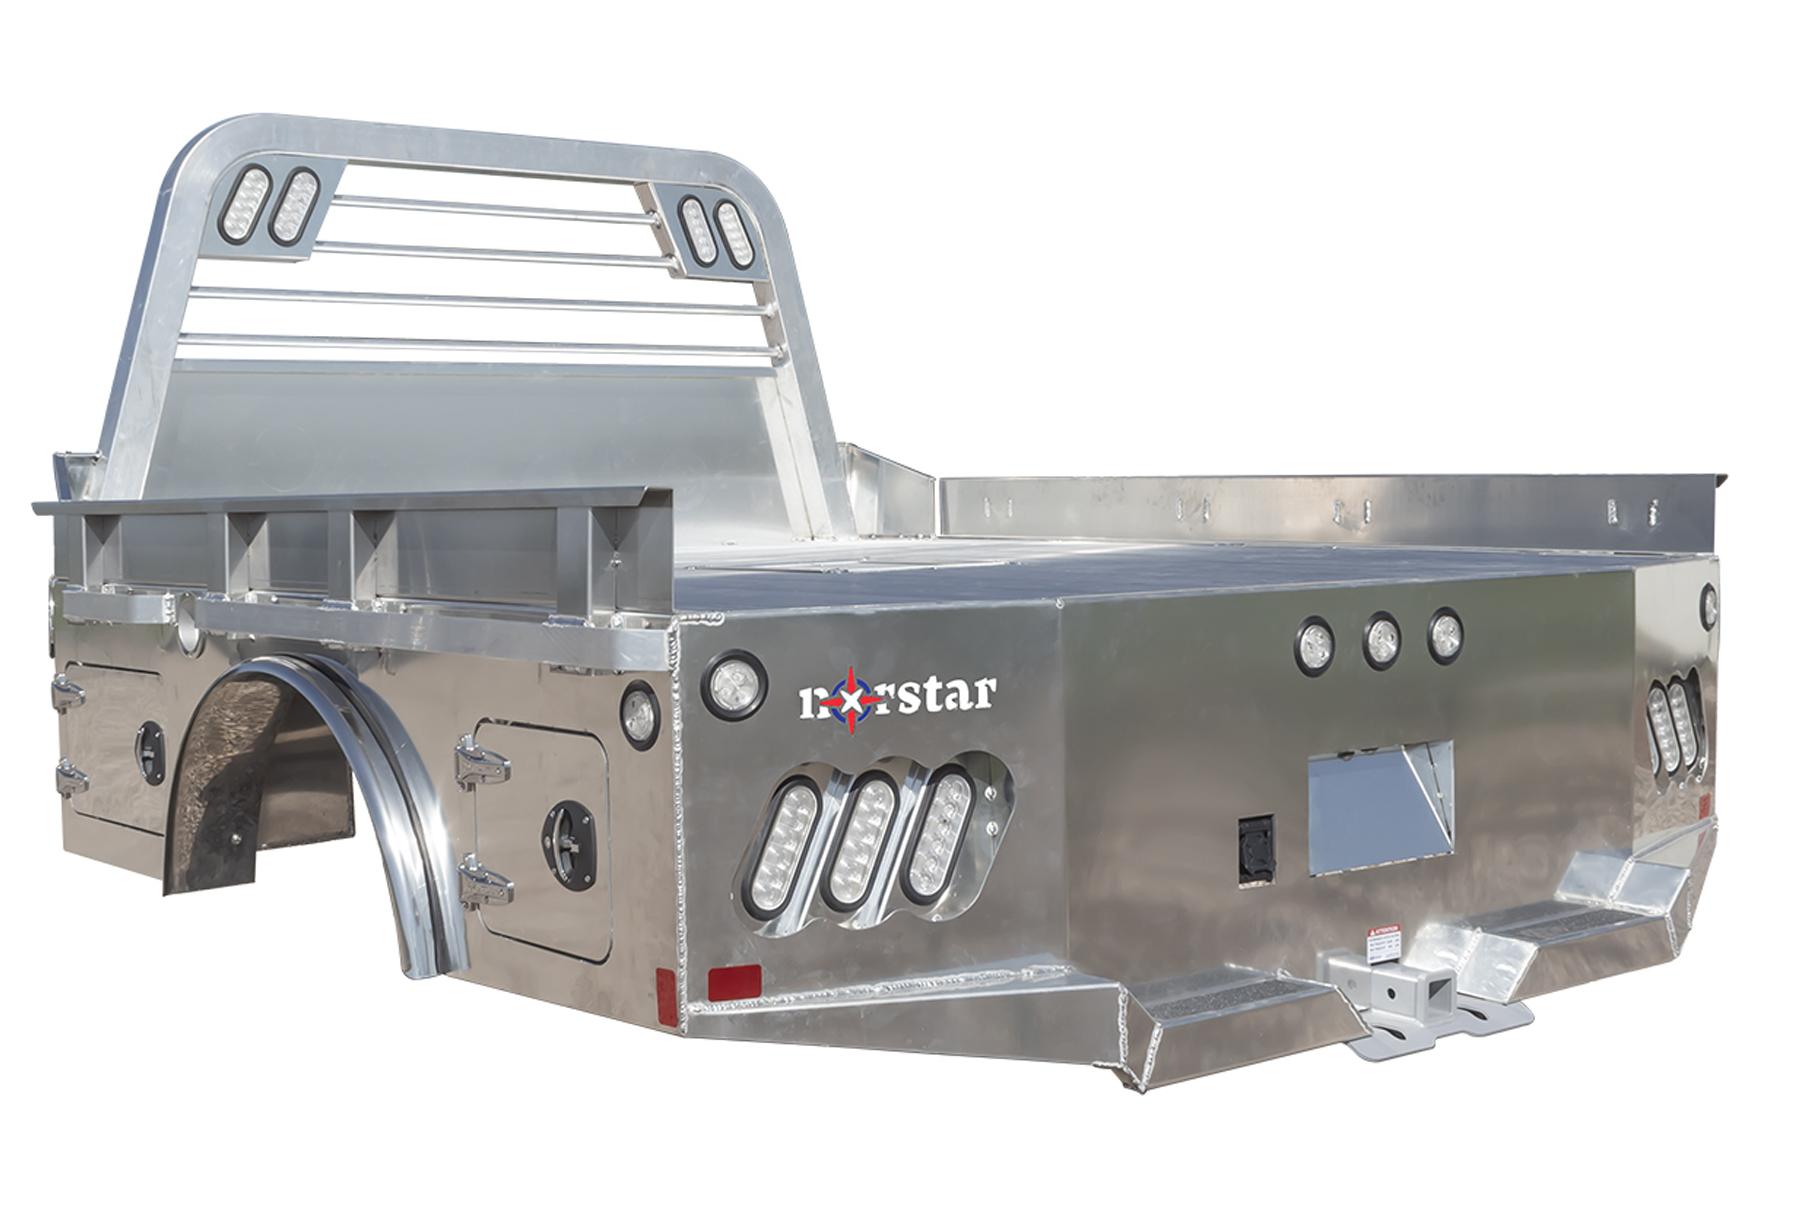 Norstar AT - Aluminum Skirted